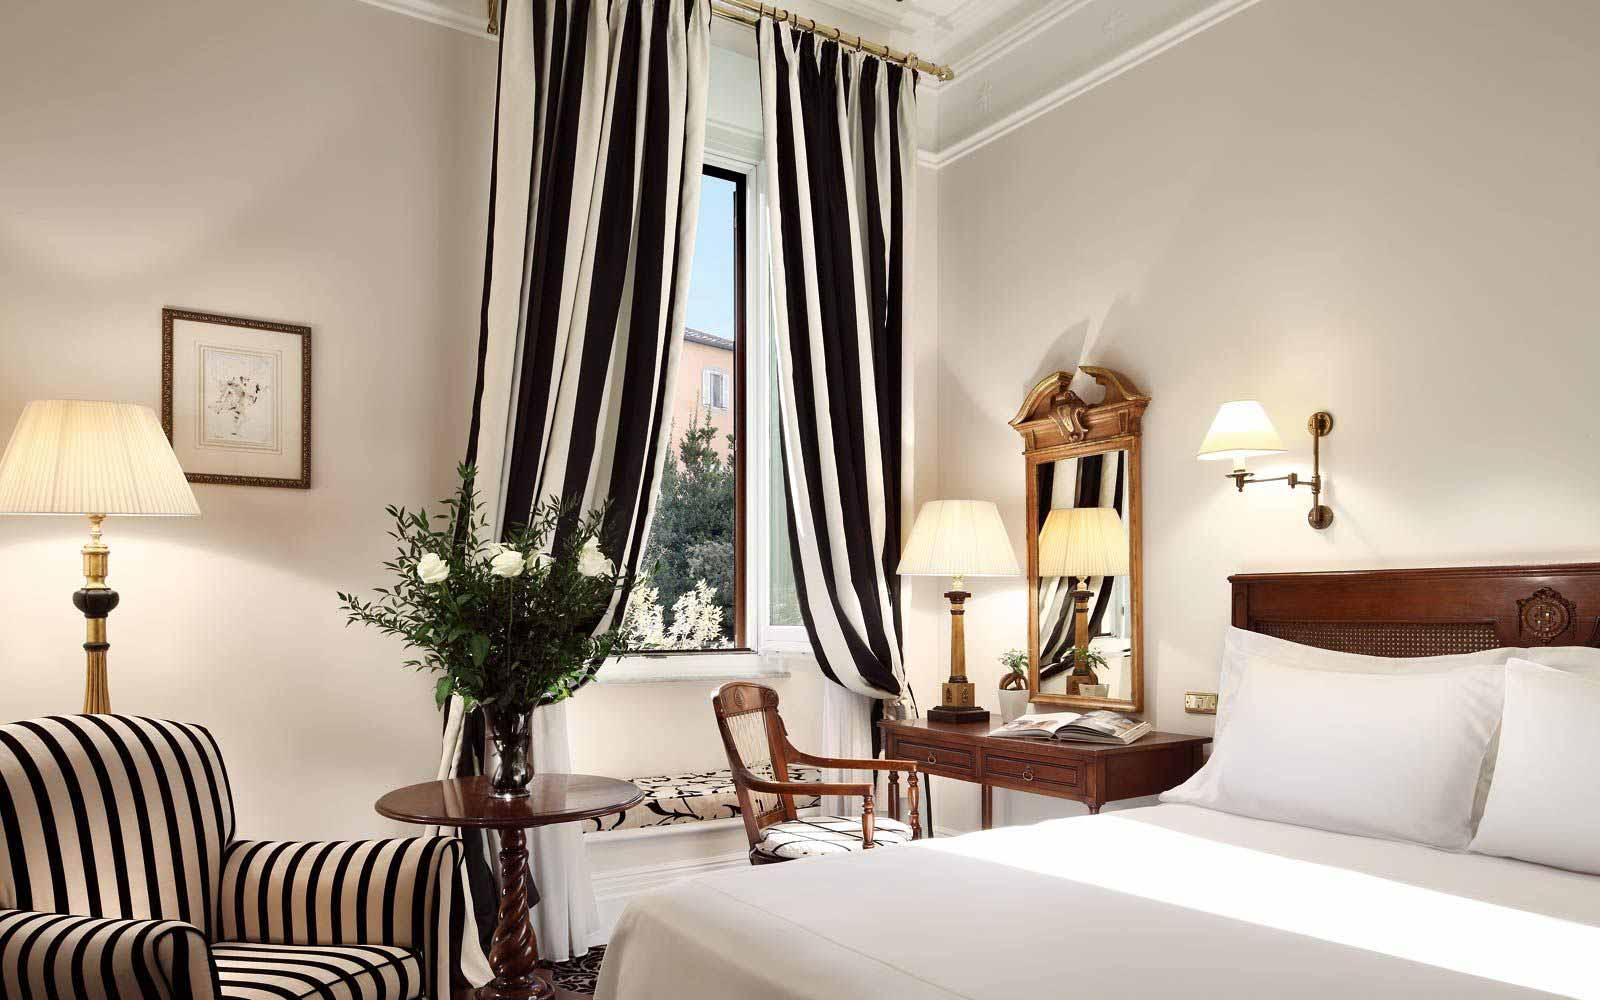 Superior room at Hotel Eden